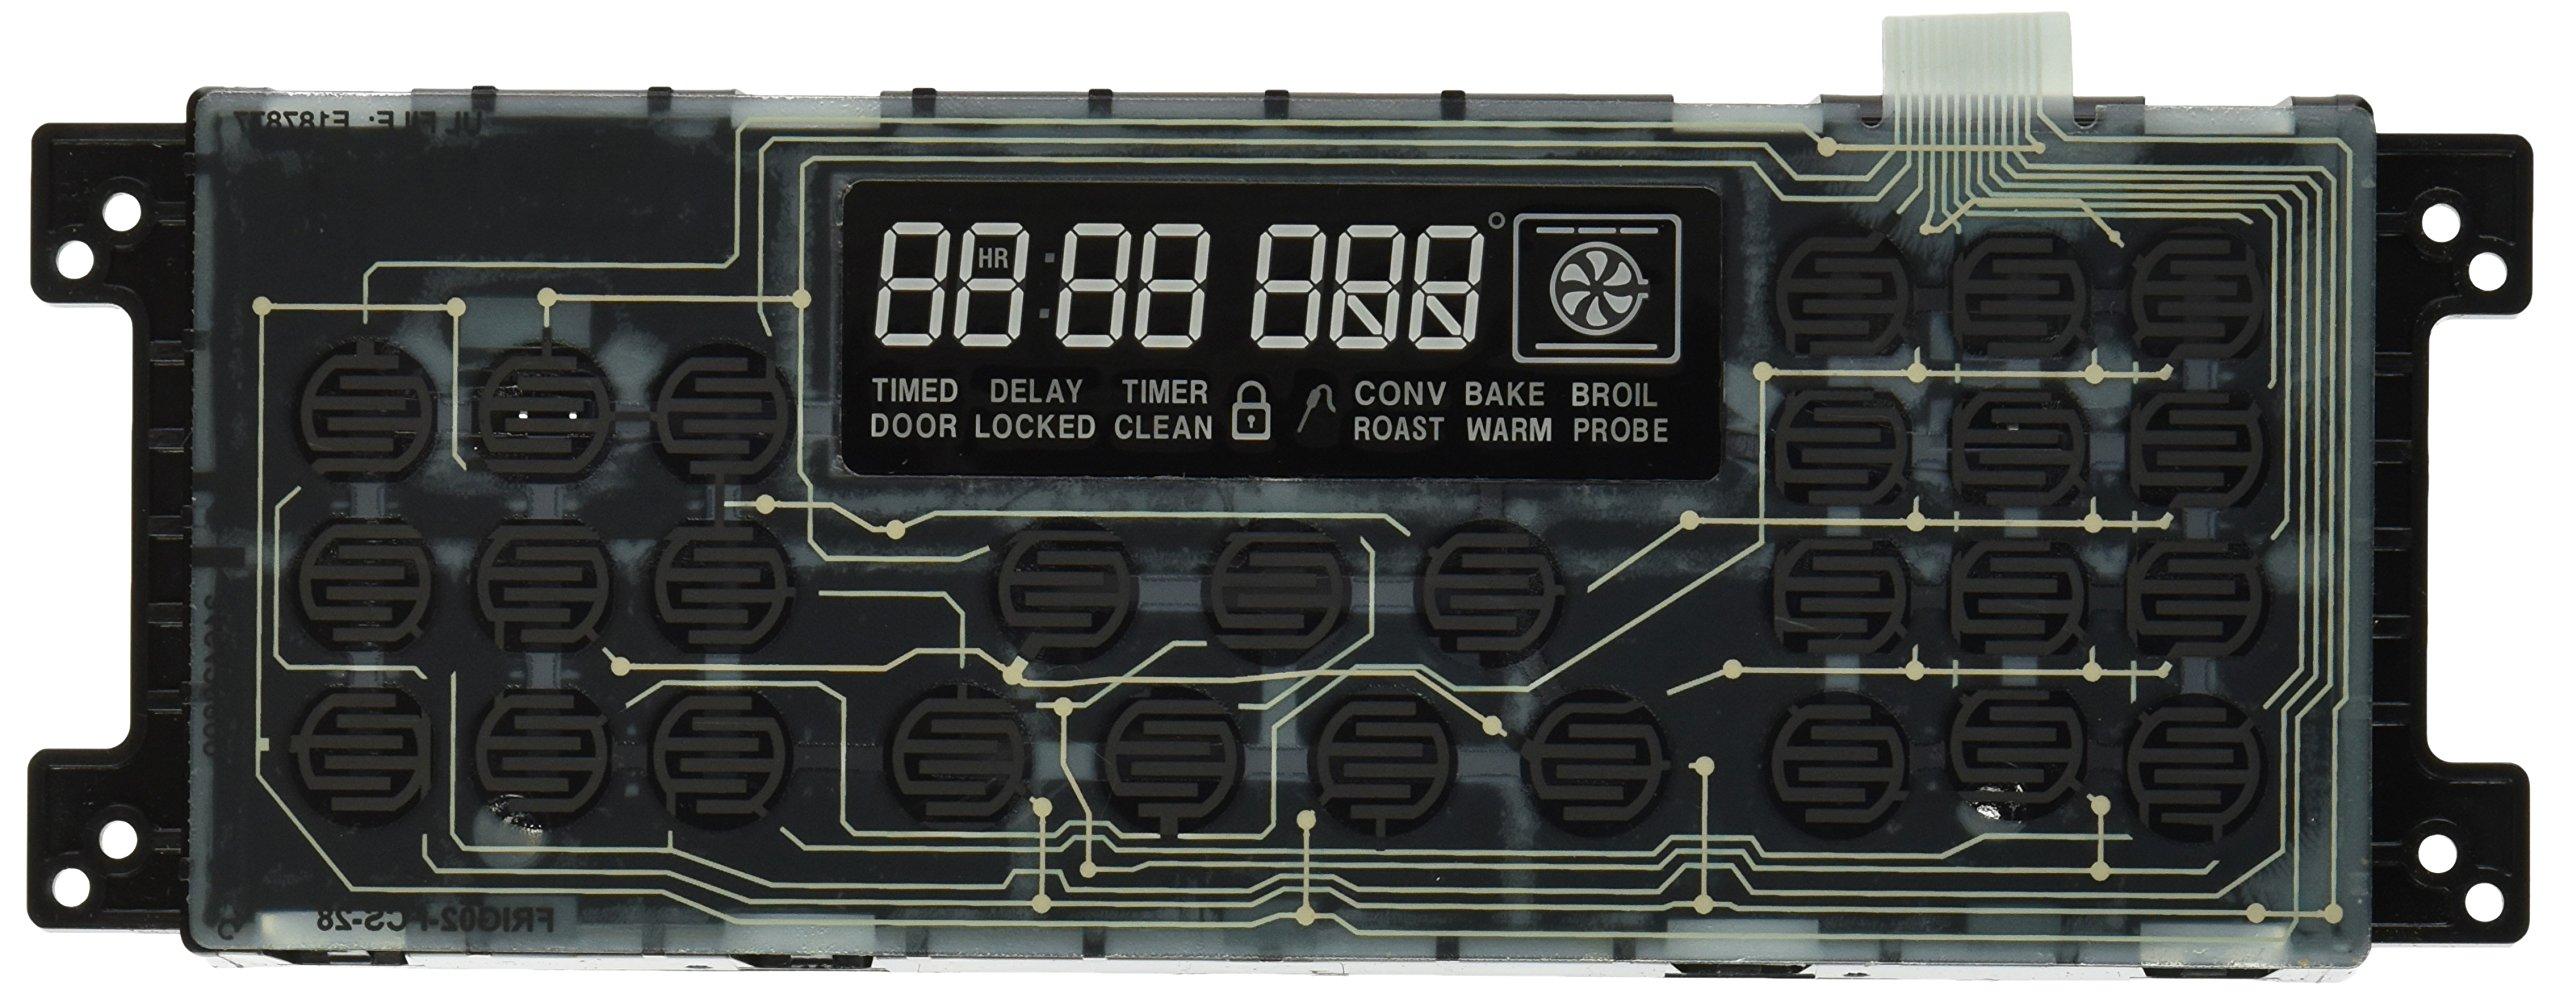 Frigidaire 316462866 Clock Timer for Range